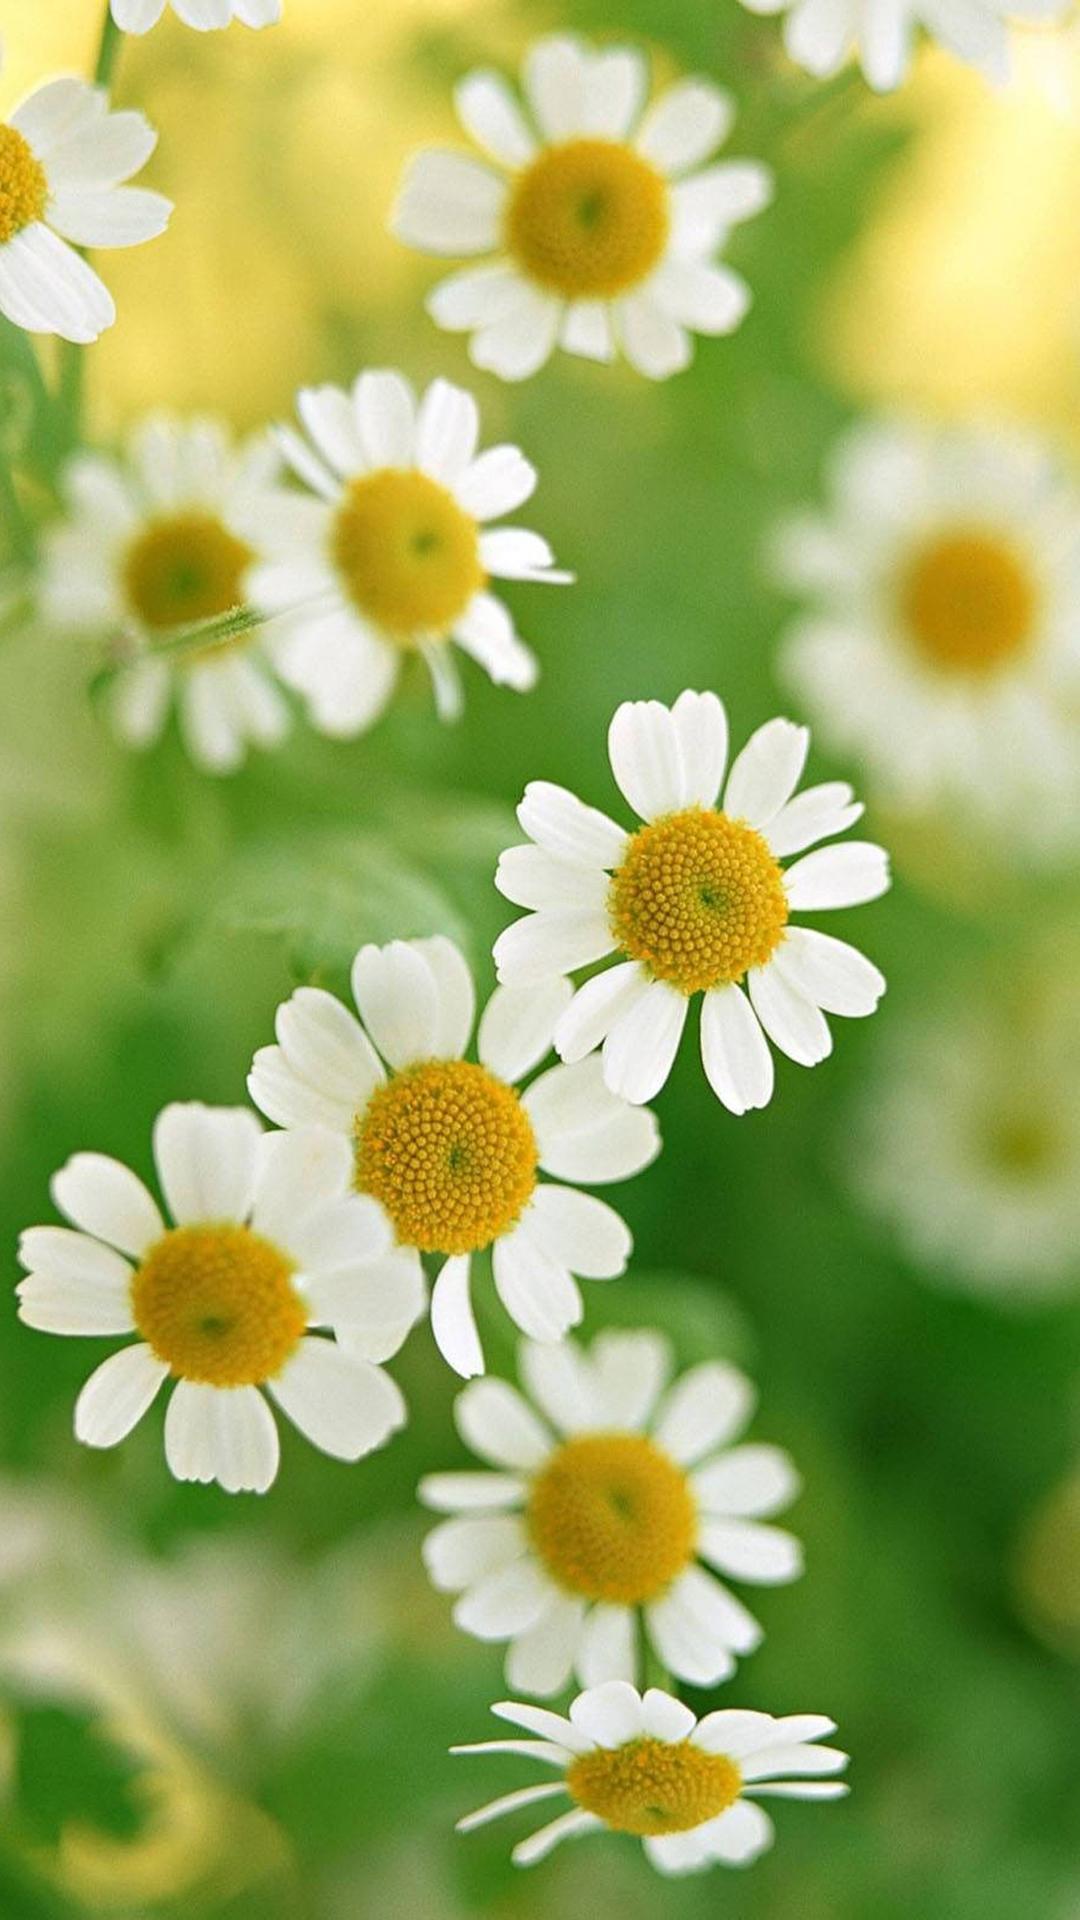 Nature White Daisy Flower iPhone 6 Wallpaperjpg 1080x1920 1080x1920